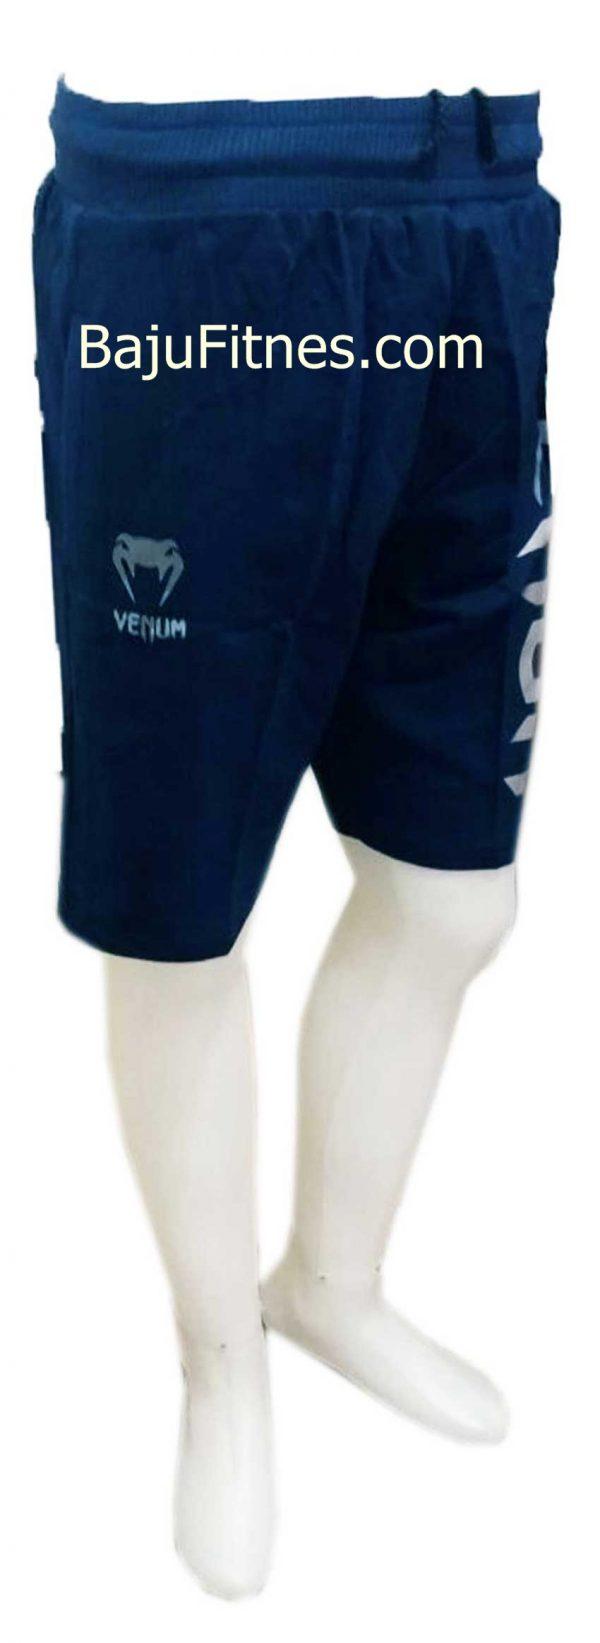 089506541896 Tri | 5599 Design Kaos MMALaki-Laki Kaskus